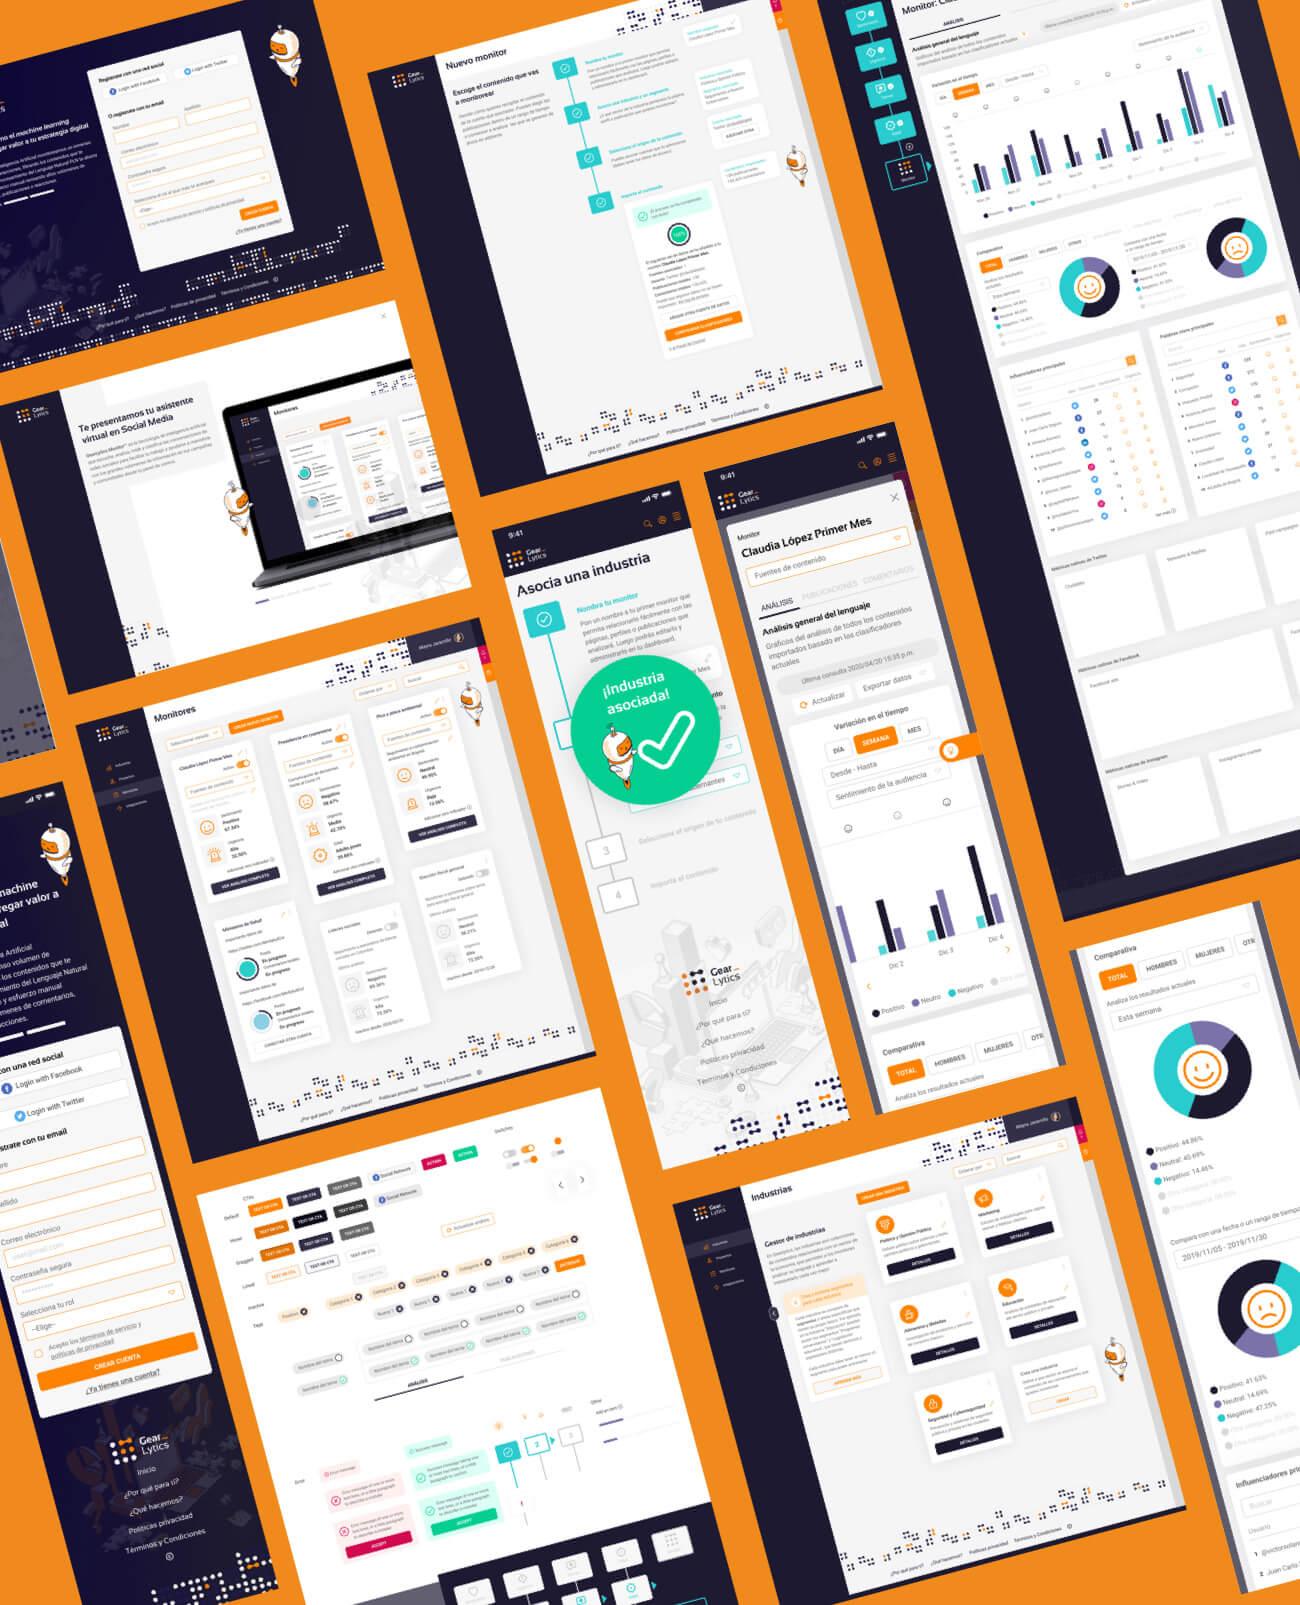 gearlytics collage pantallas